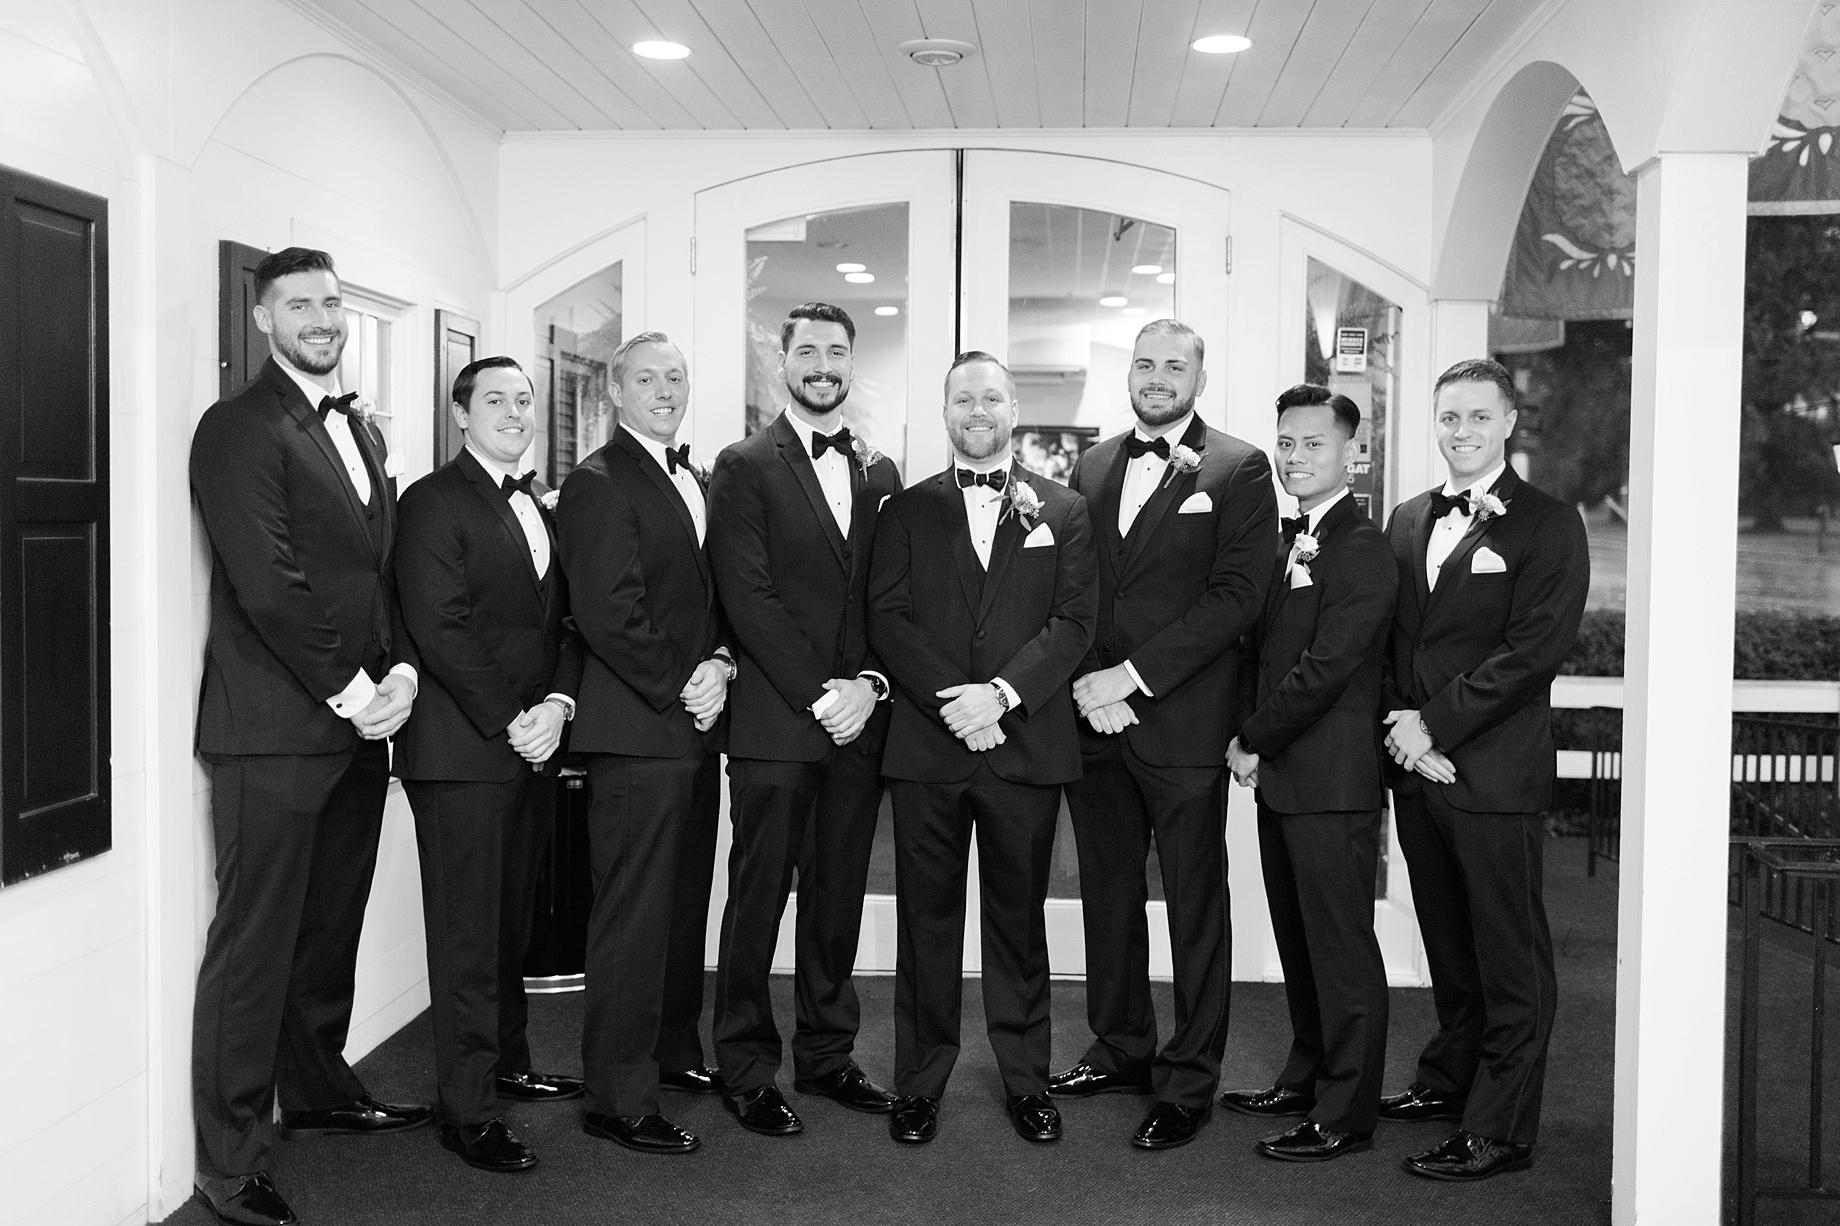 groomsmen in all black tuxes with bowties   William Penn Inn Wedding